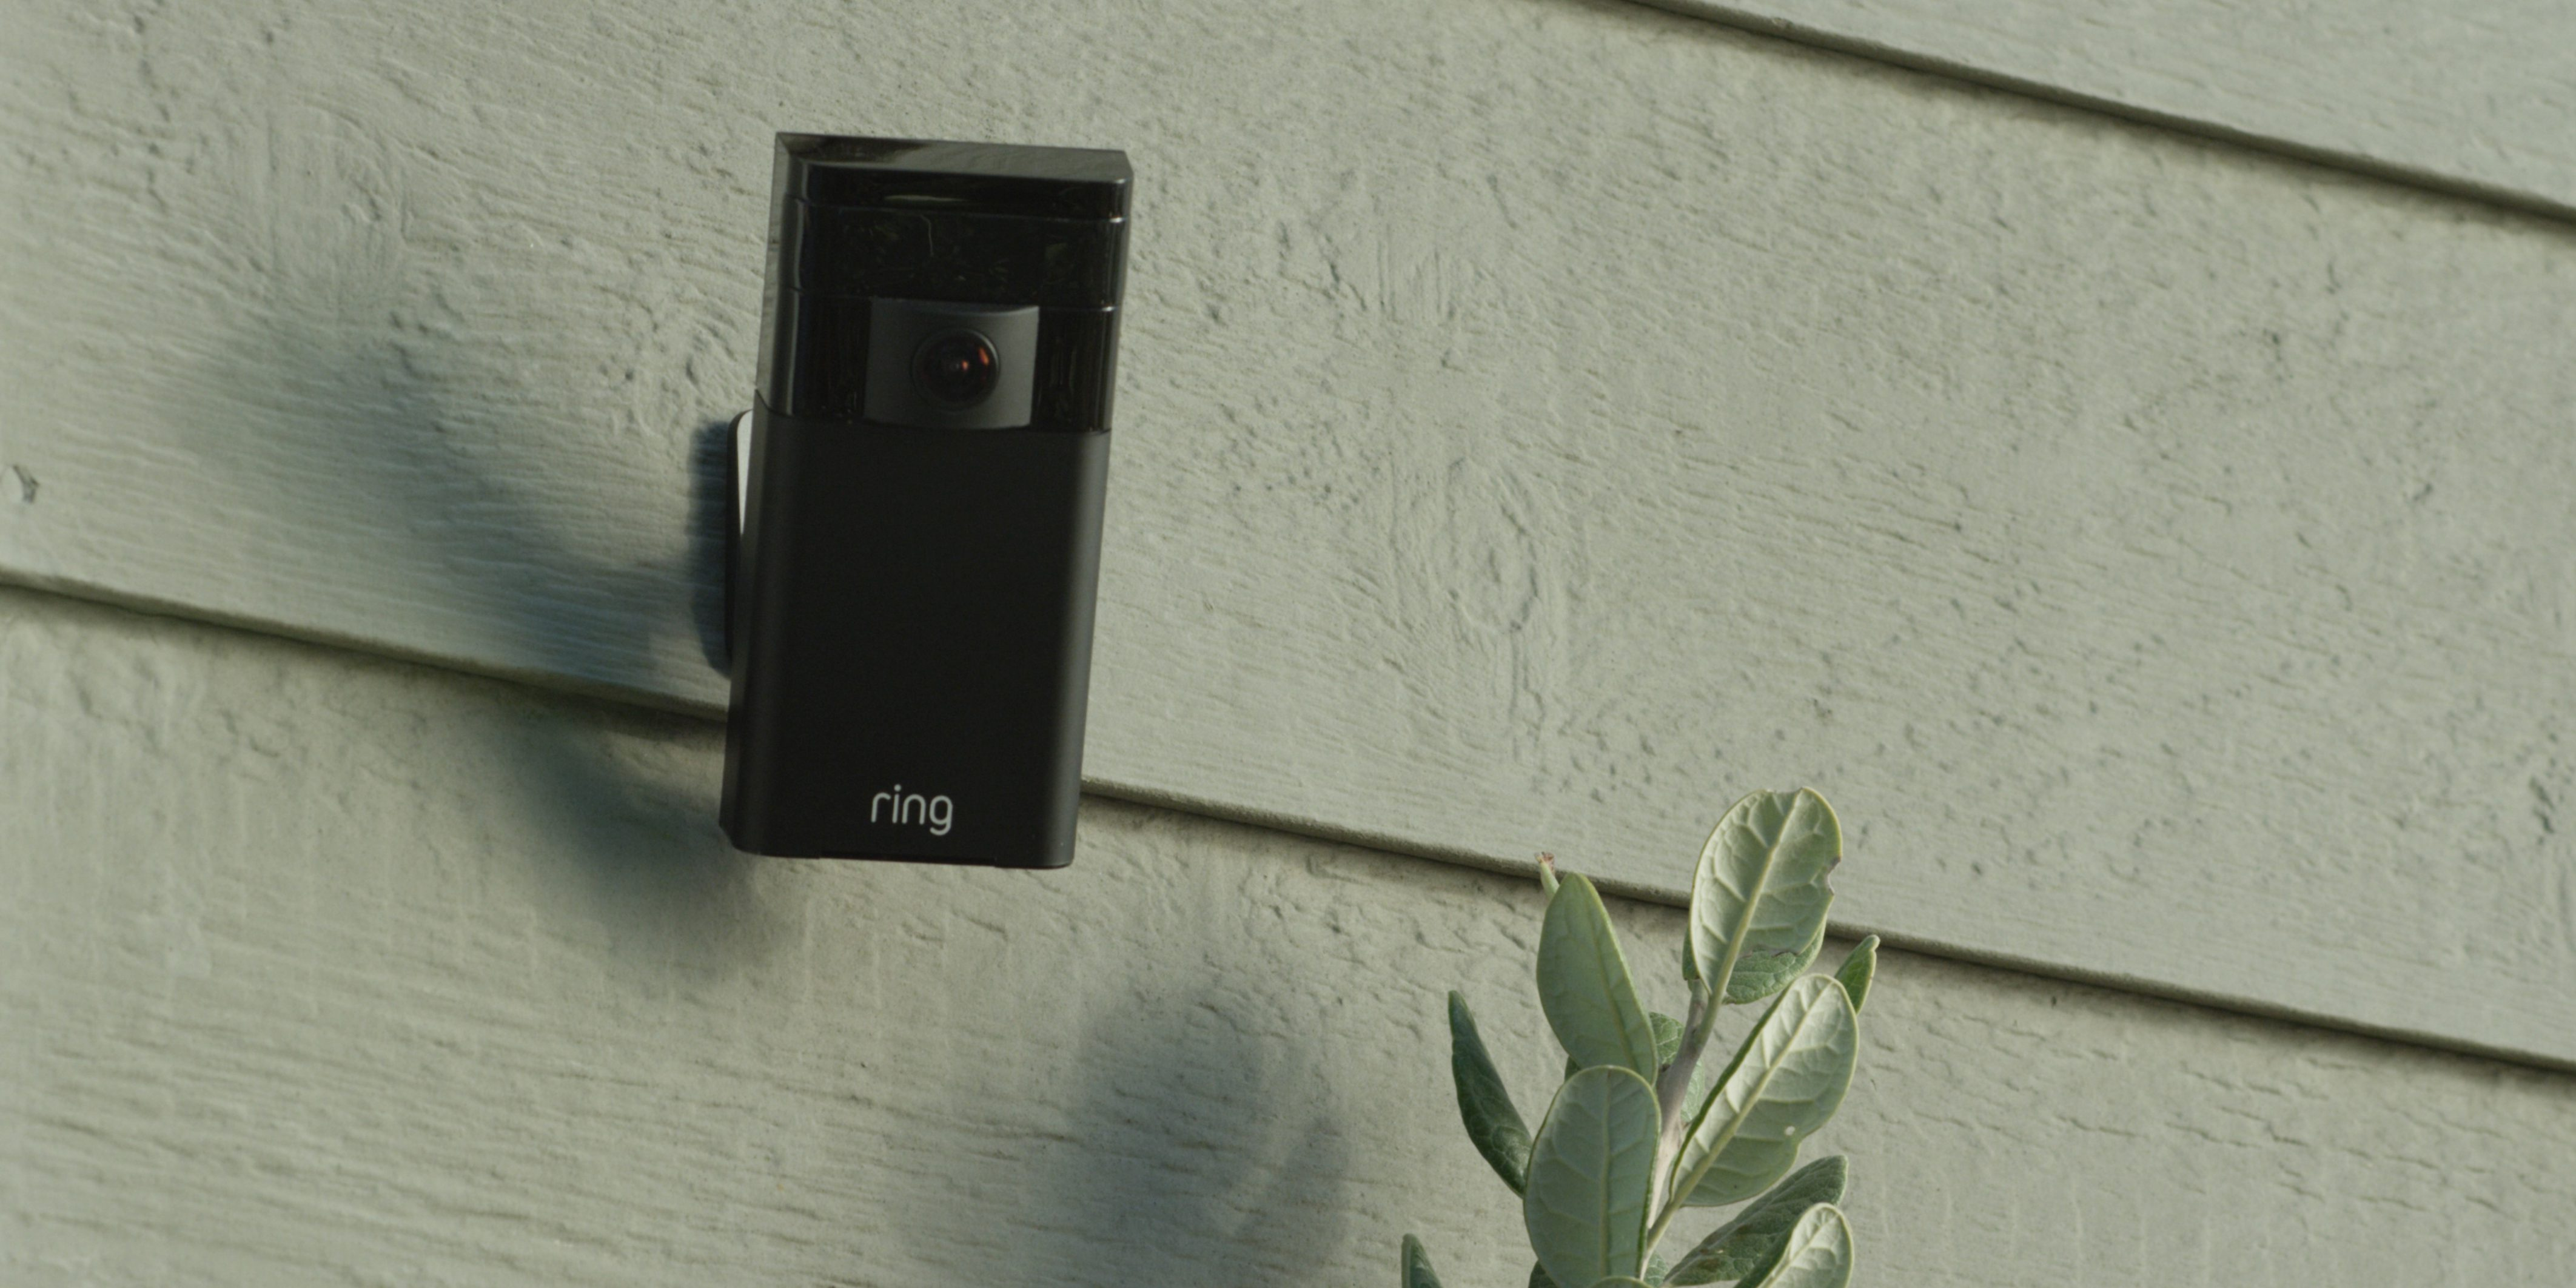 ring-stick-up-camera